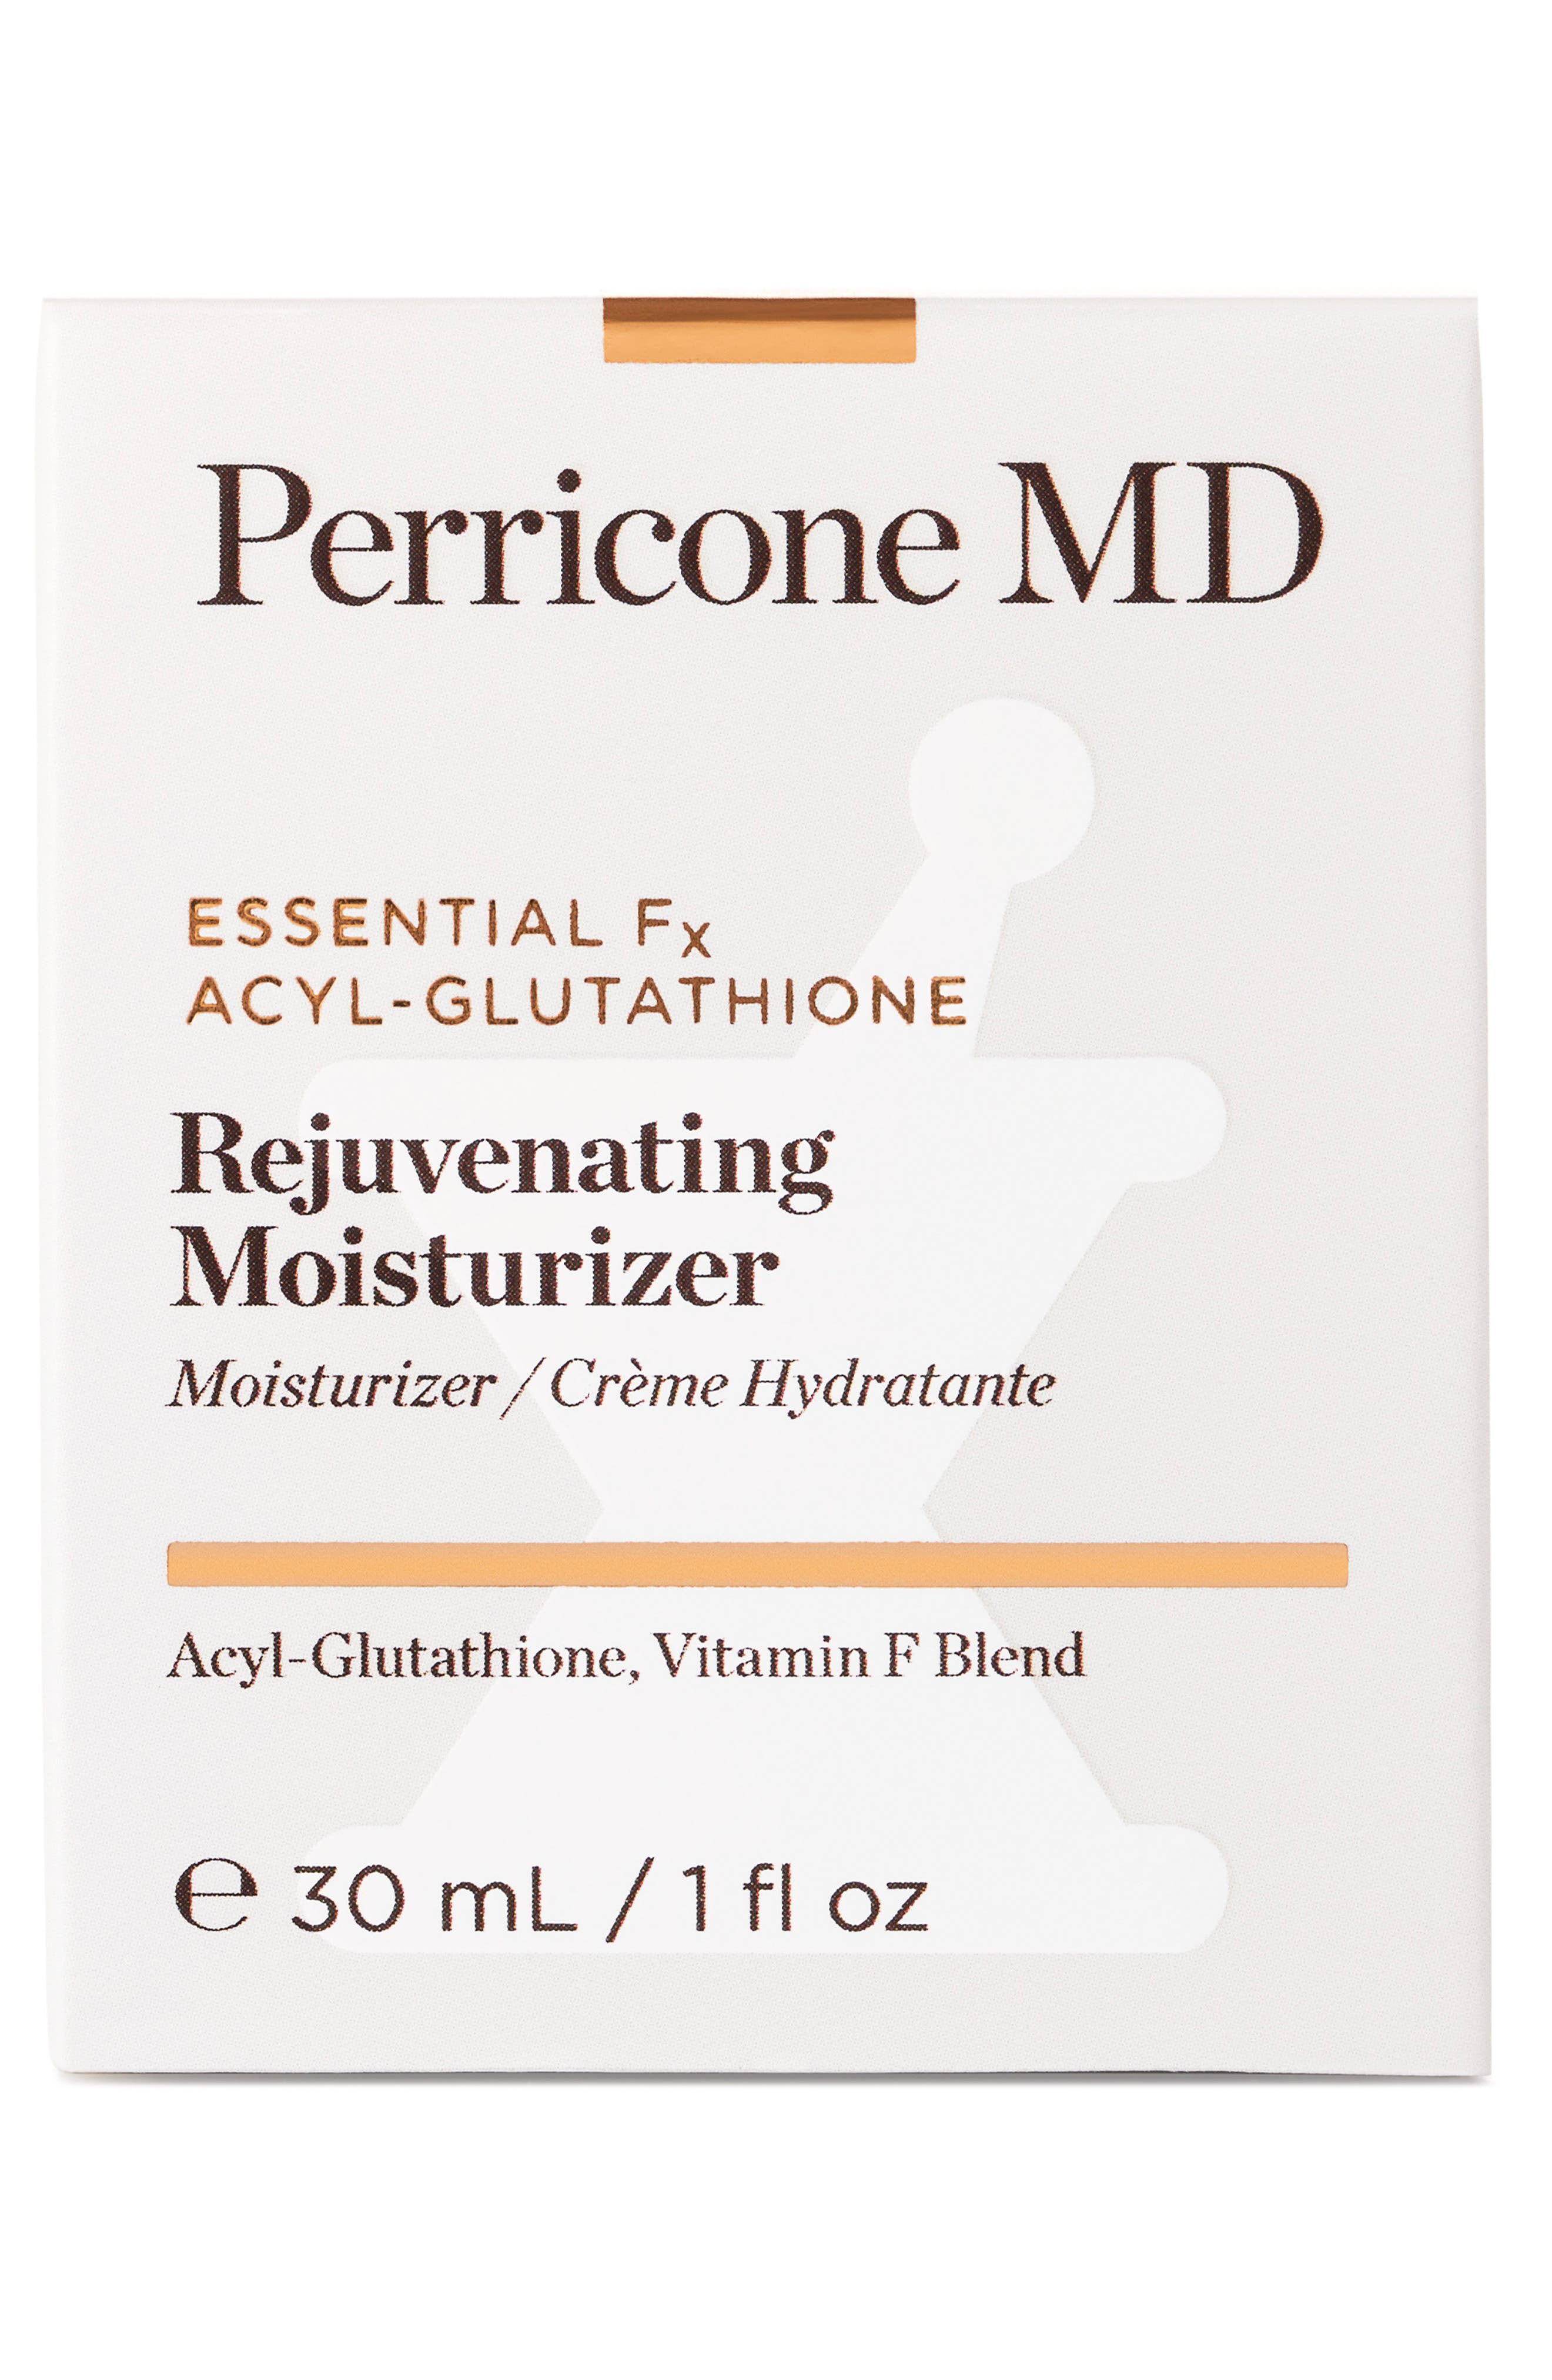 PERRICONE MD, Essential Fx Acyl-Glutathione Rejuvenating Moisturizer, Alternate thumbnail 4, color, NO COLOR